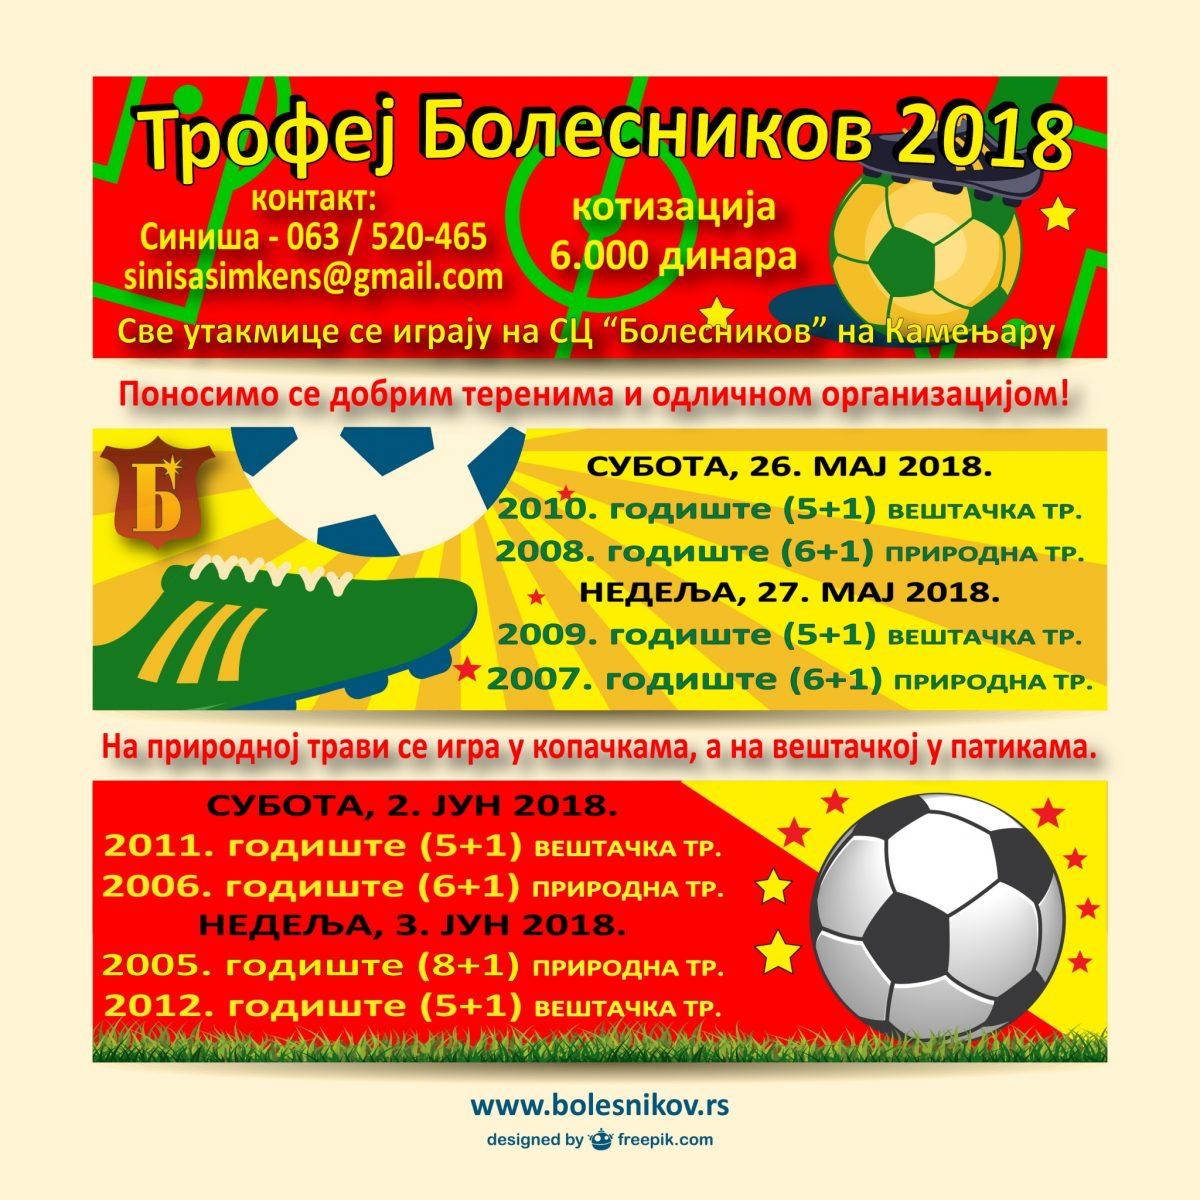 """Trofej Bolesnikov 2018"""